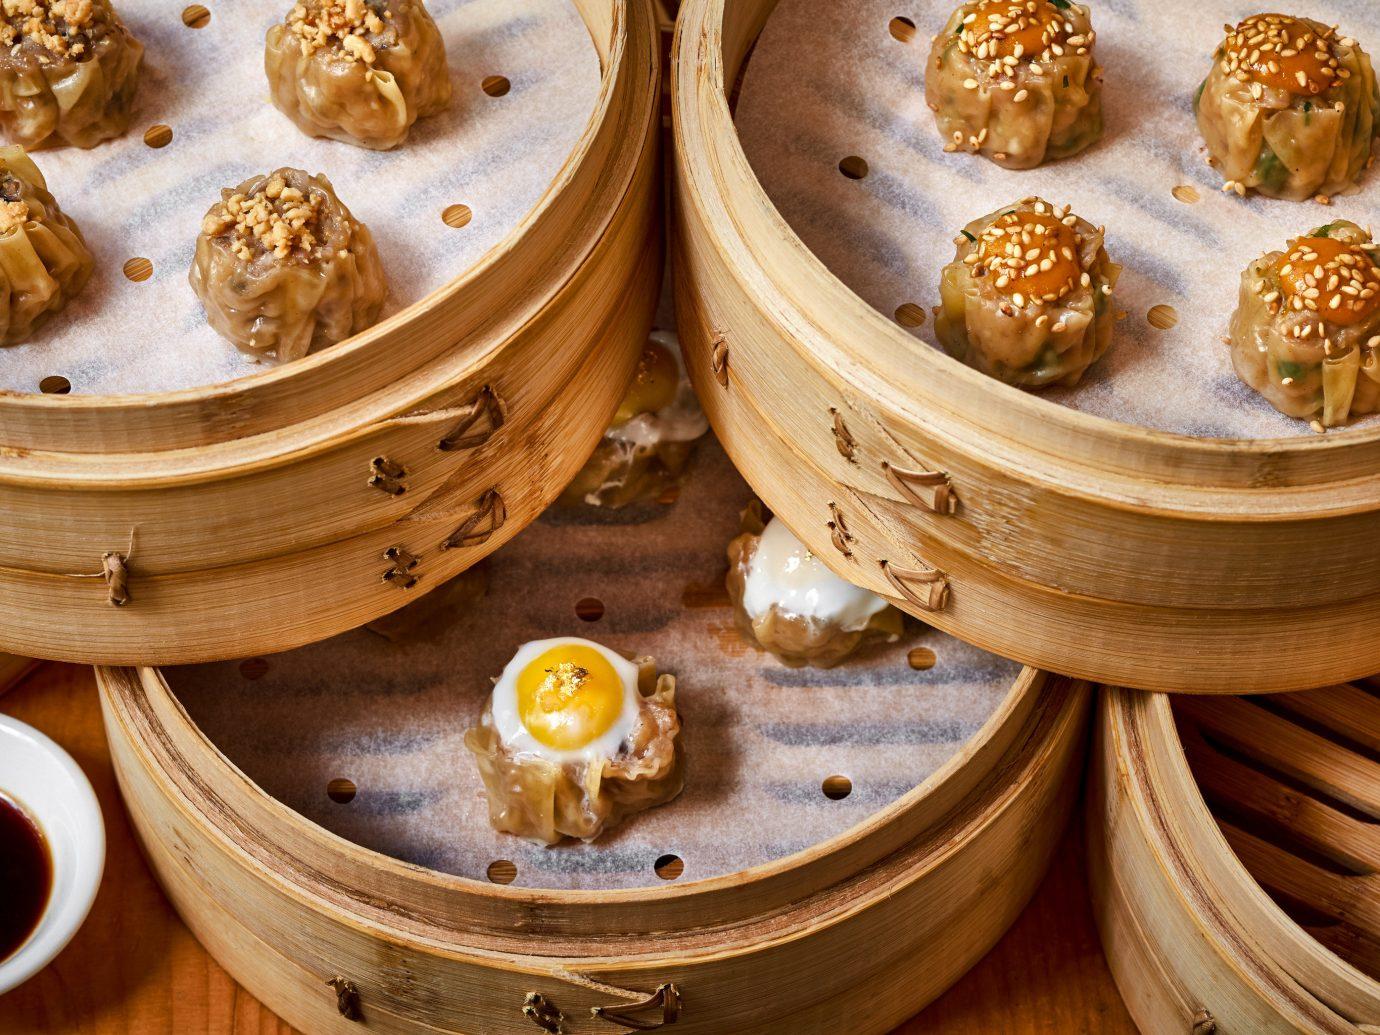 Food + Drink dim sum food dish cuisine chinese food dim sim xiaolongbao finger food asian food wooden mongolian food baozi commodity baking several